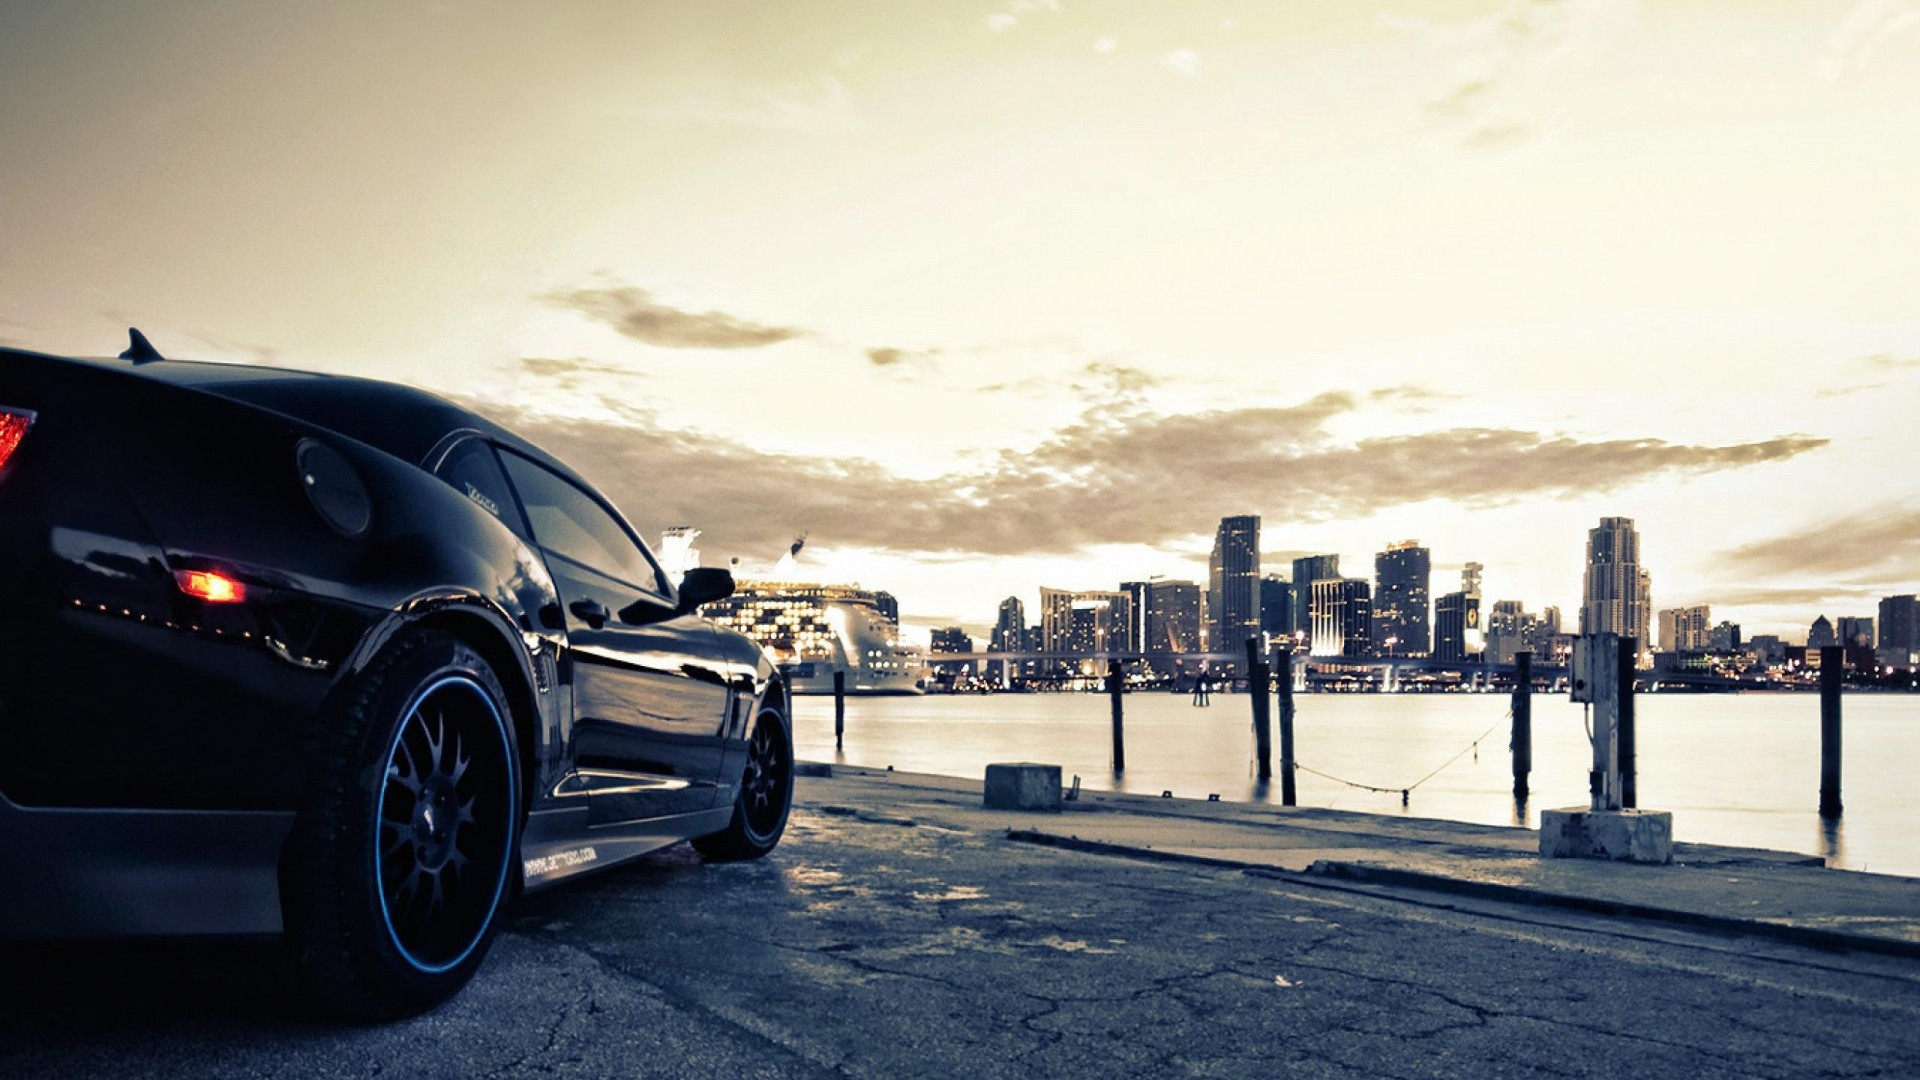 auto, black, style